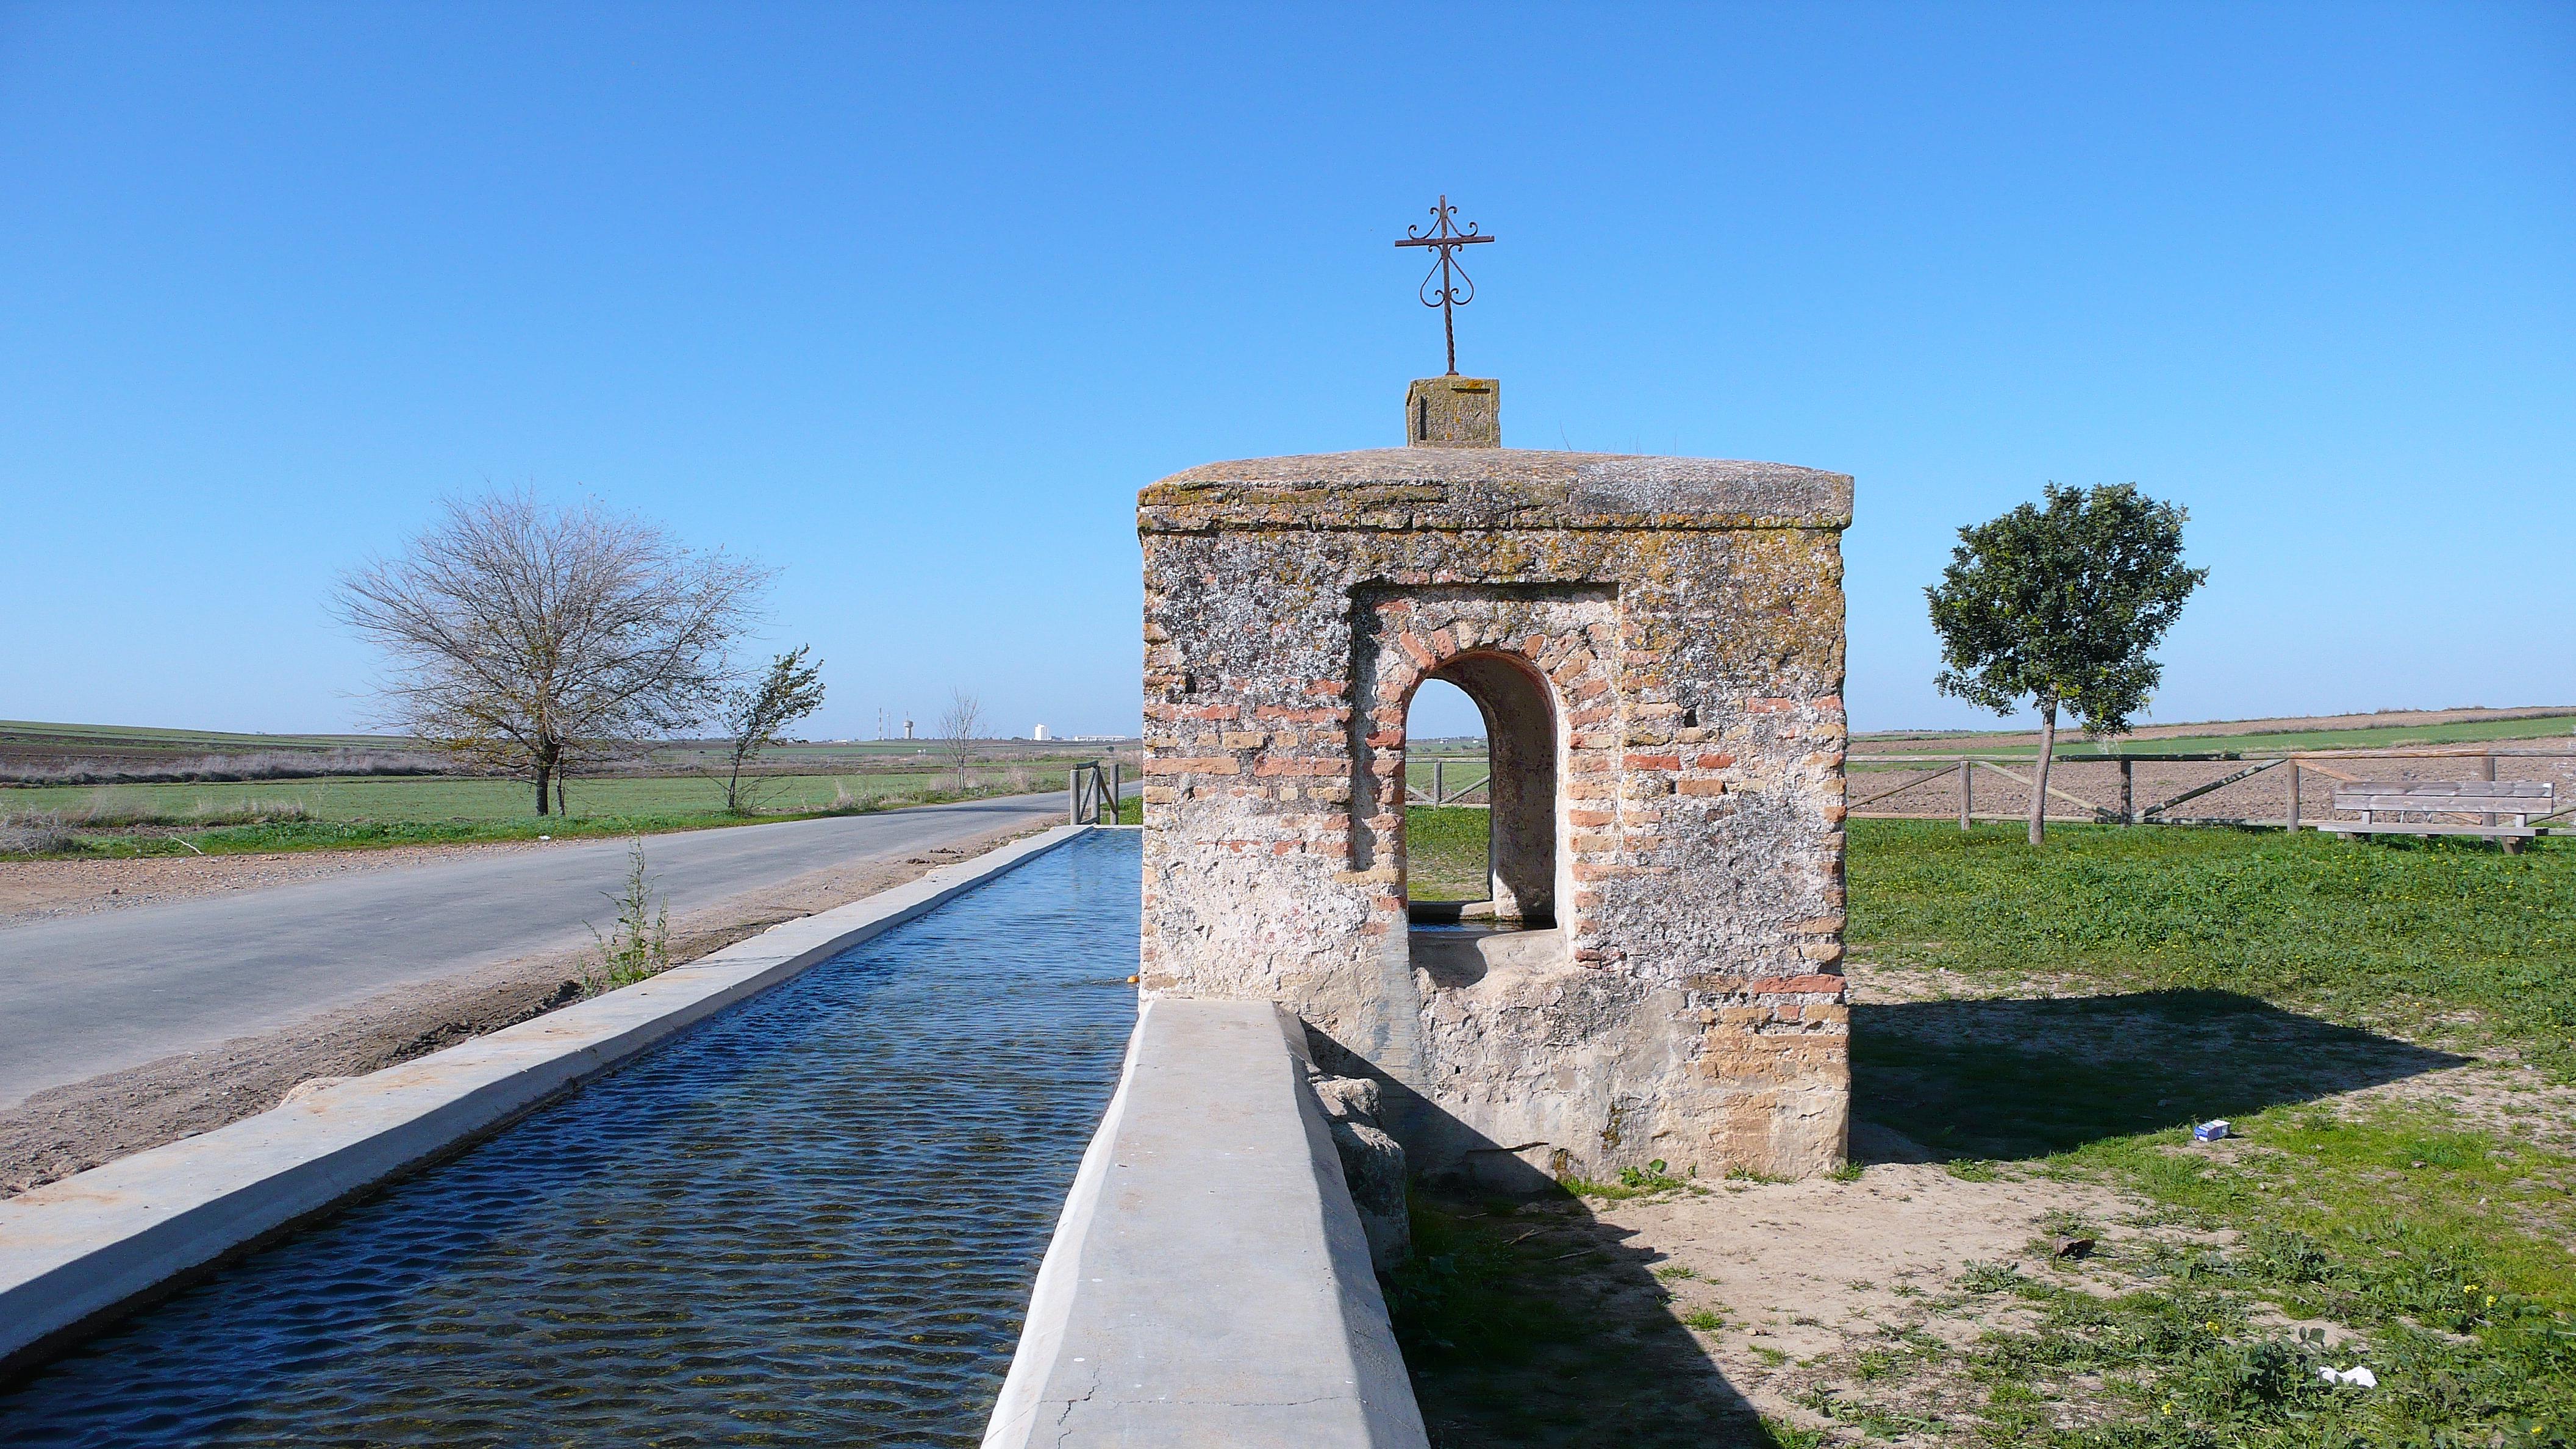 Archivo:Pilar de la Media Legua, Trigueros (Huelva).jpg ...